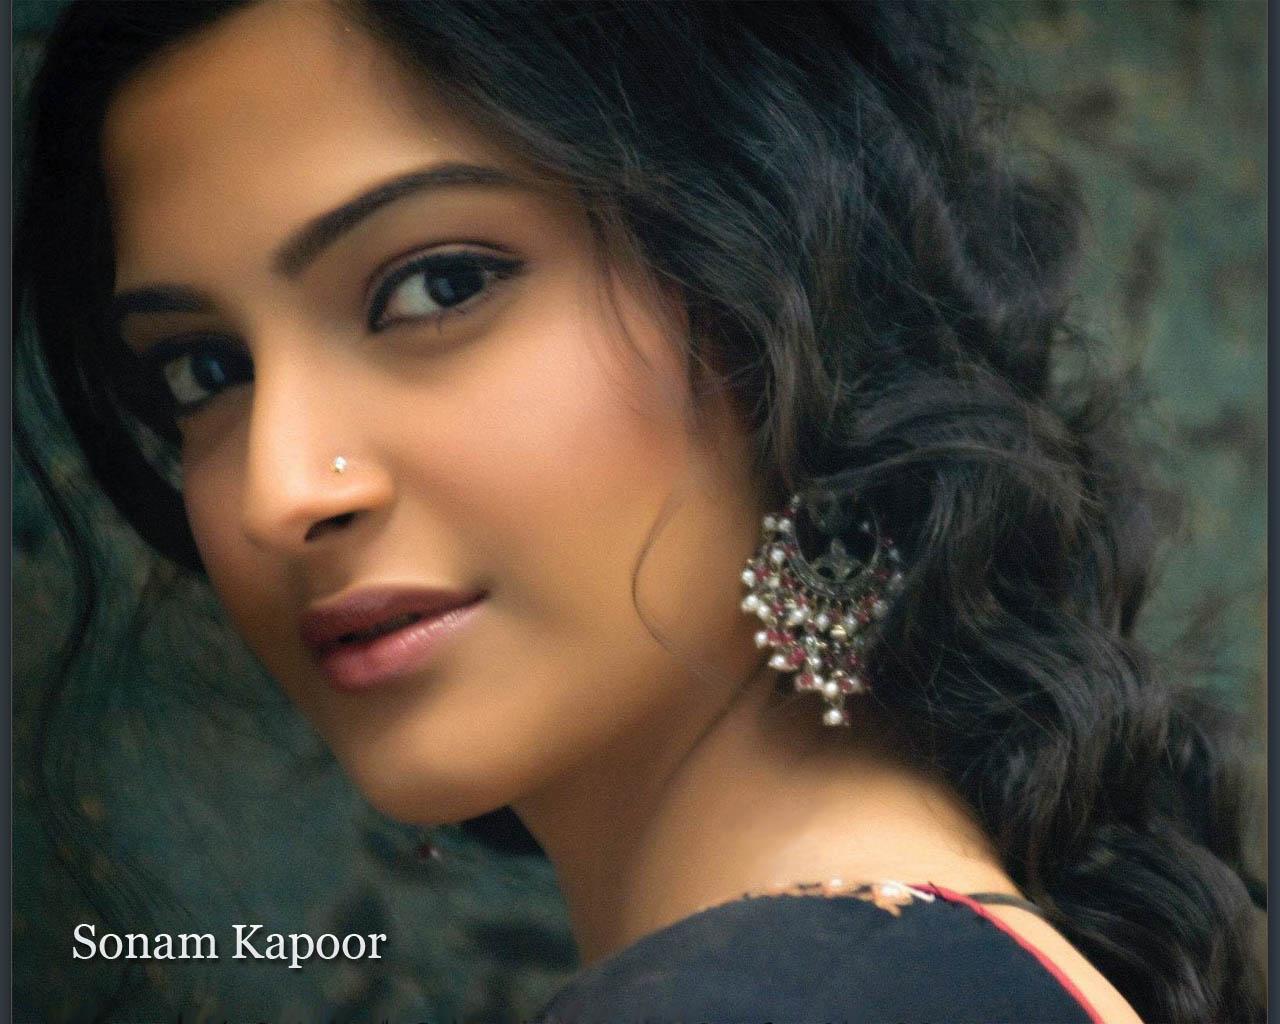 http://3.bp.blogspot.com/_9KHB1qdgTys/TKgxjhCKS1I/AAAAAAAAANk/2w5j800ZUrE/s1600/Sonam-Kapoor-8.jpg